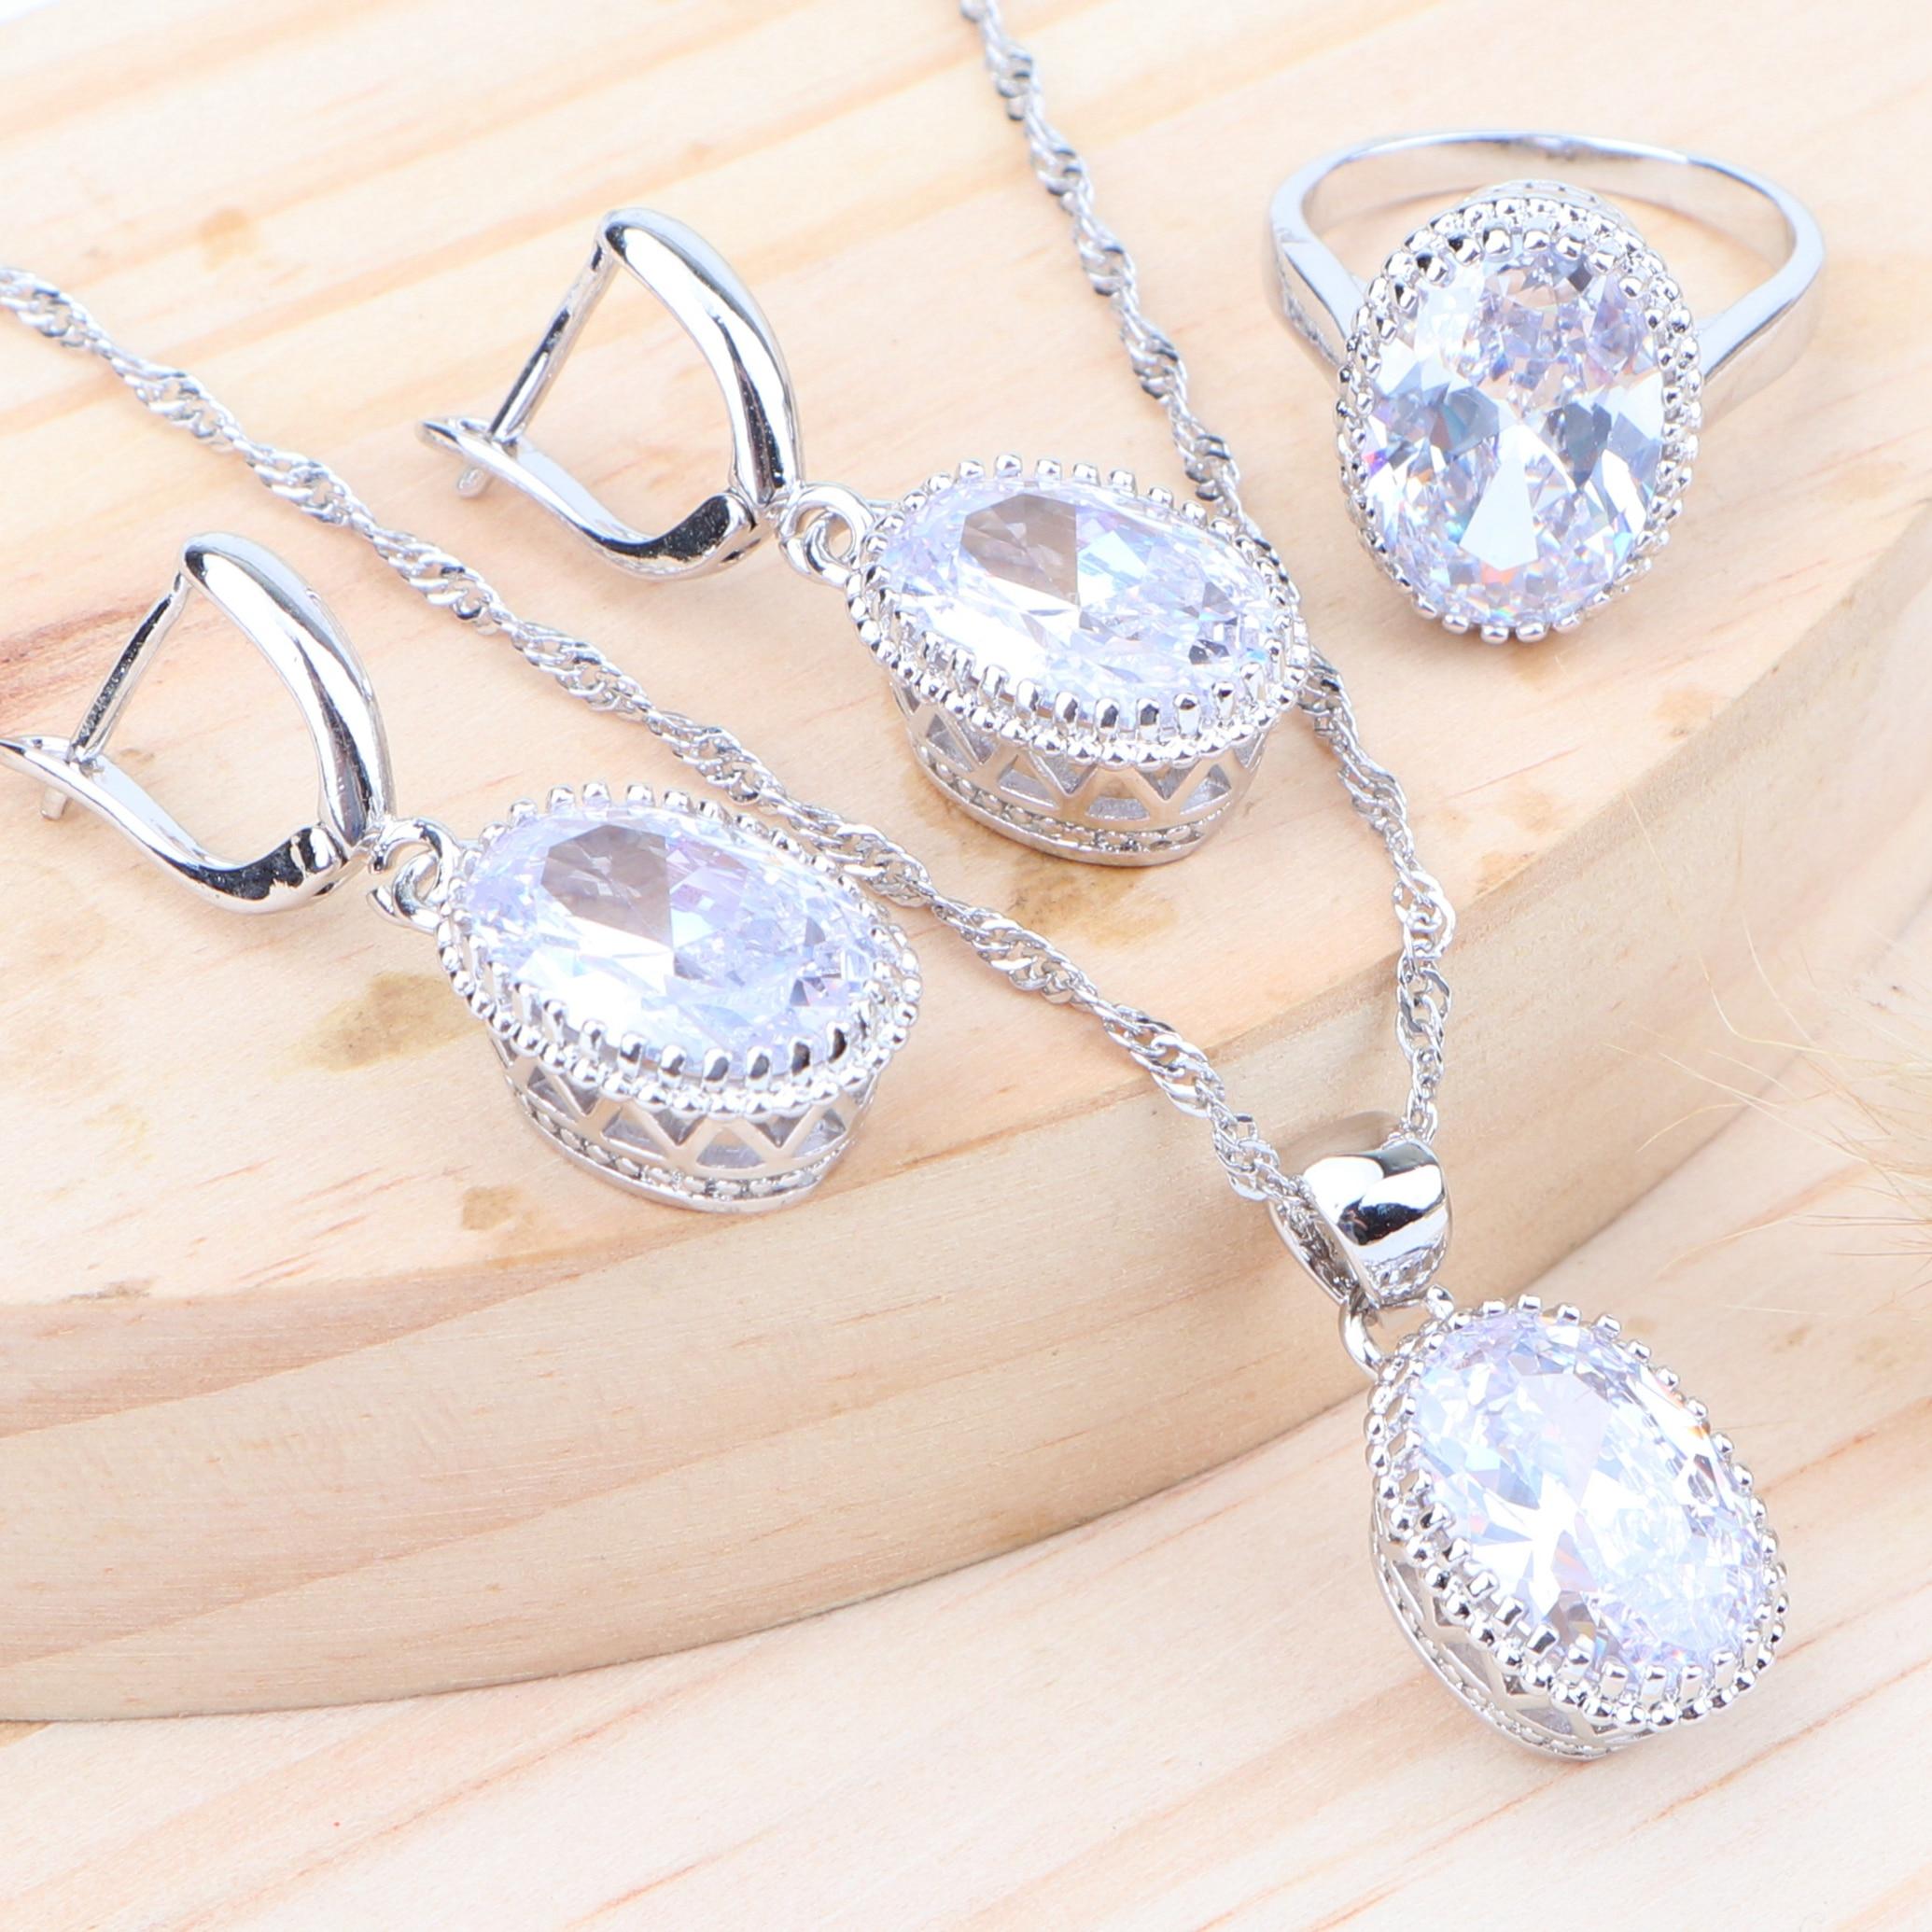 Wedding Bridal Women Silver 925 Jewelry Sets Zirconia Kids Costume Jewelry Ring Earrings Necklace Pendant Set Jewellery